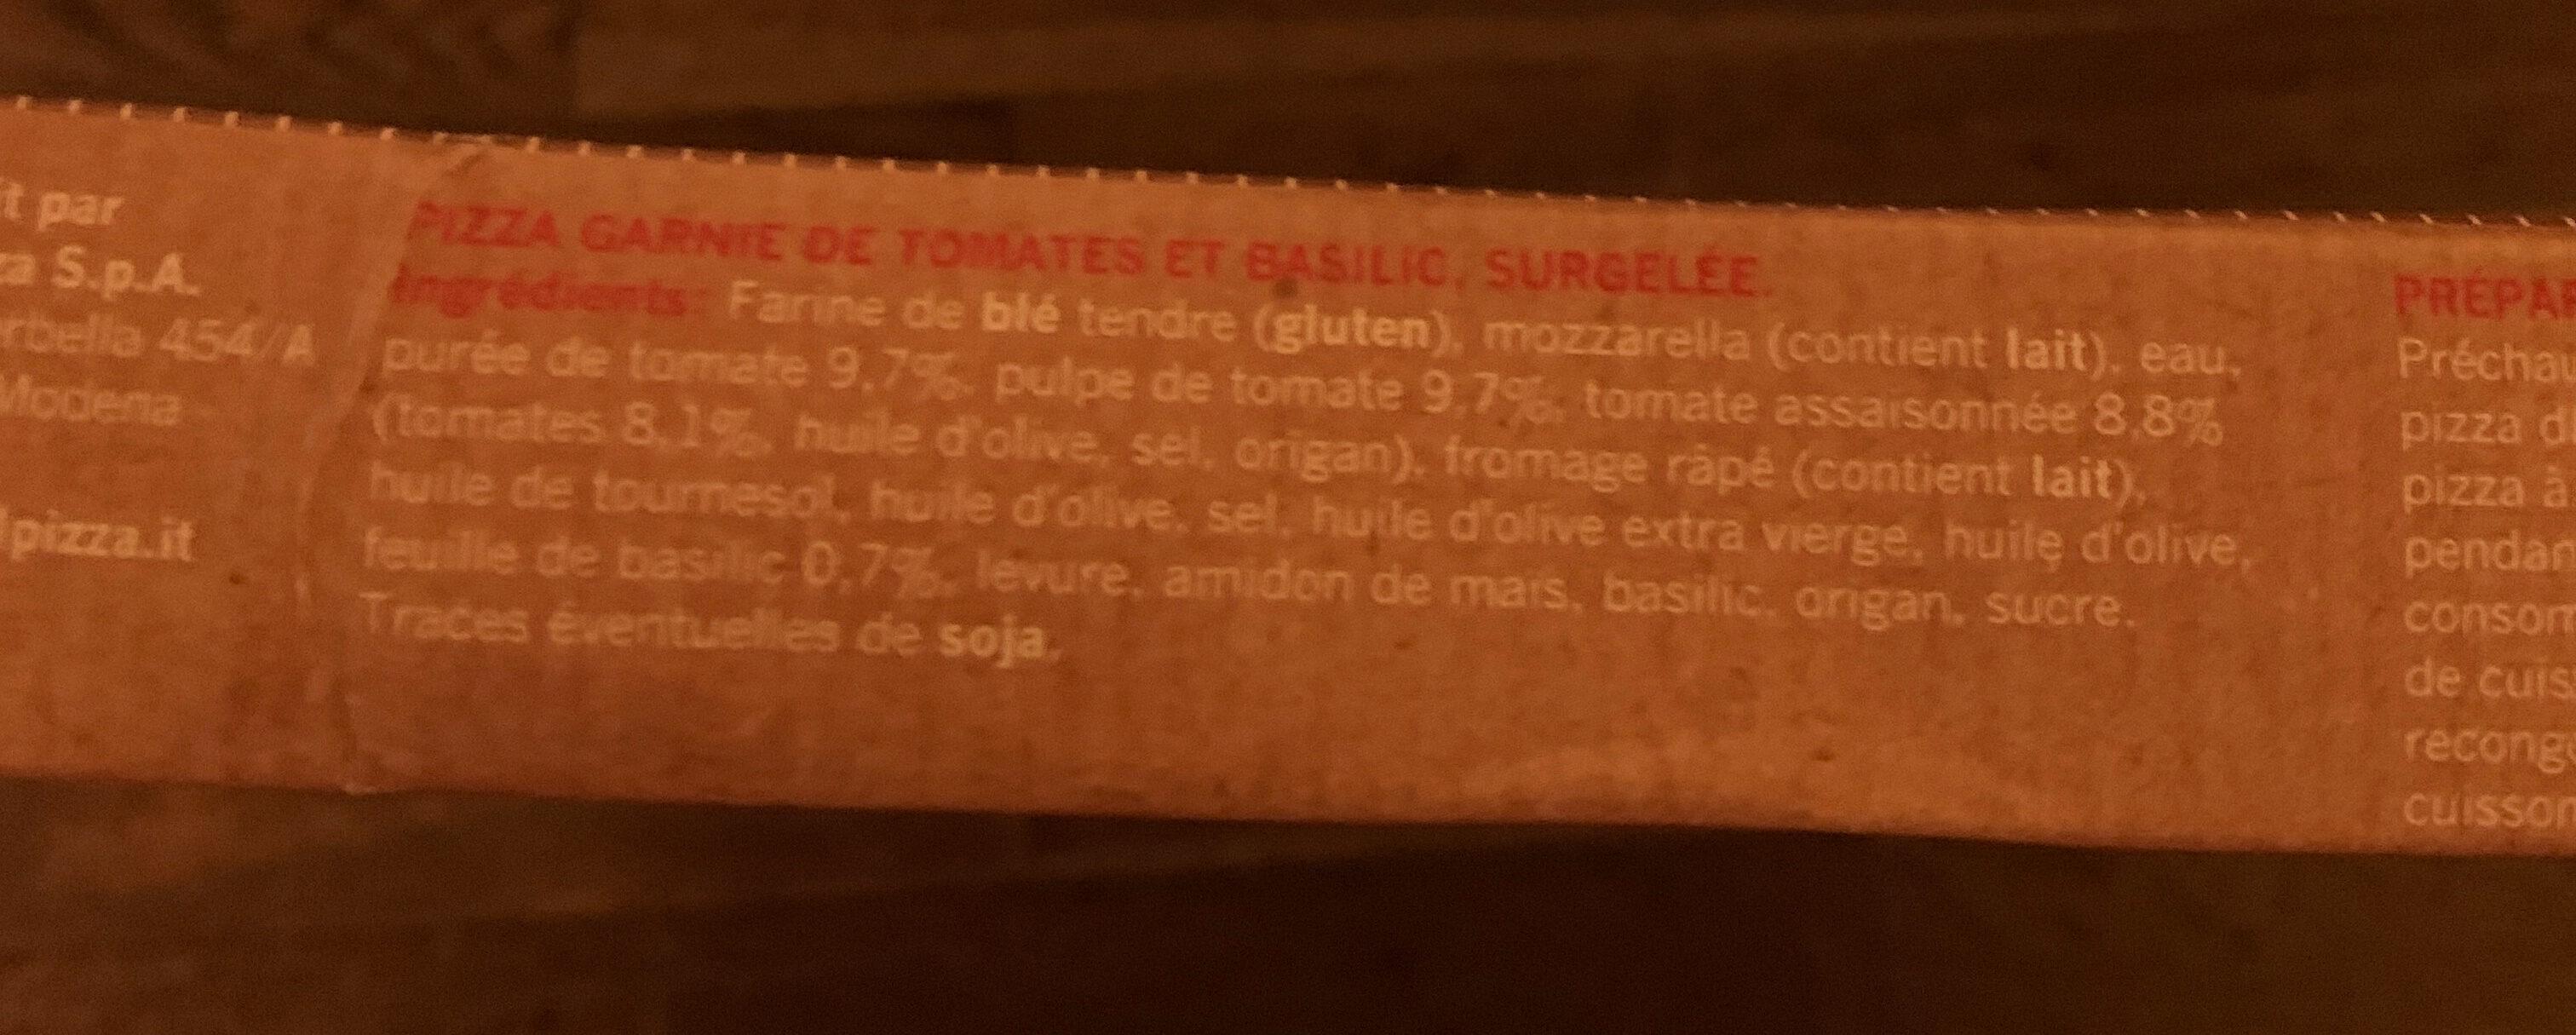 Pizza Pomodorini e basilico - Ingrédients - fr